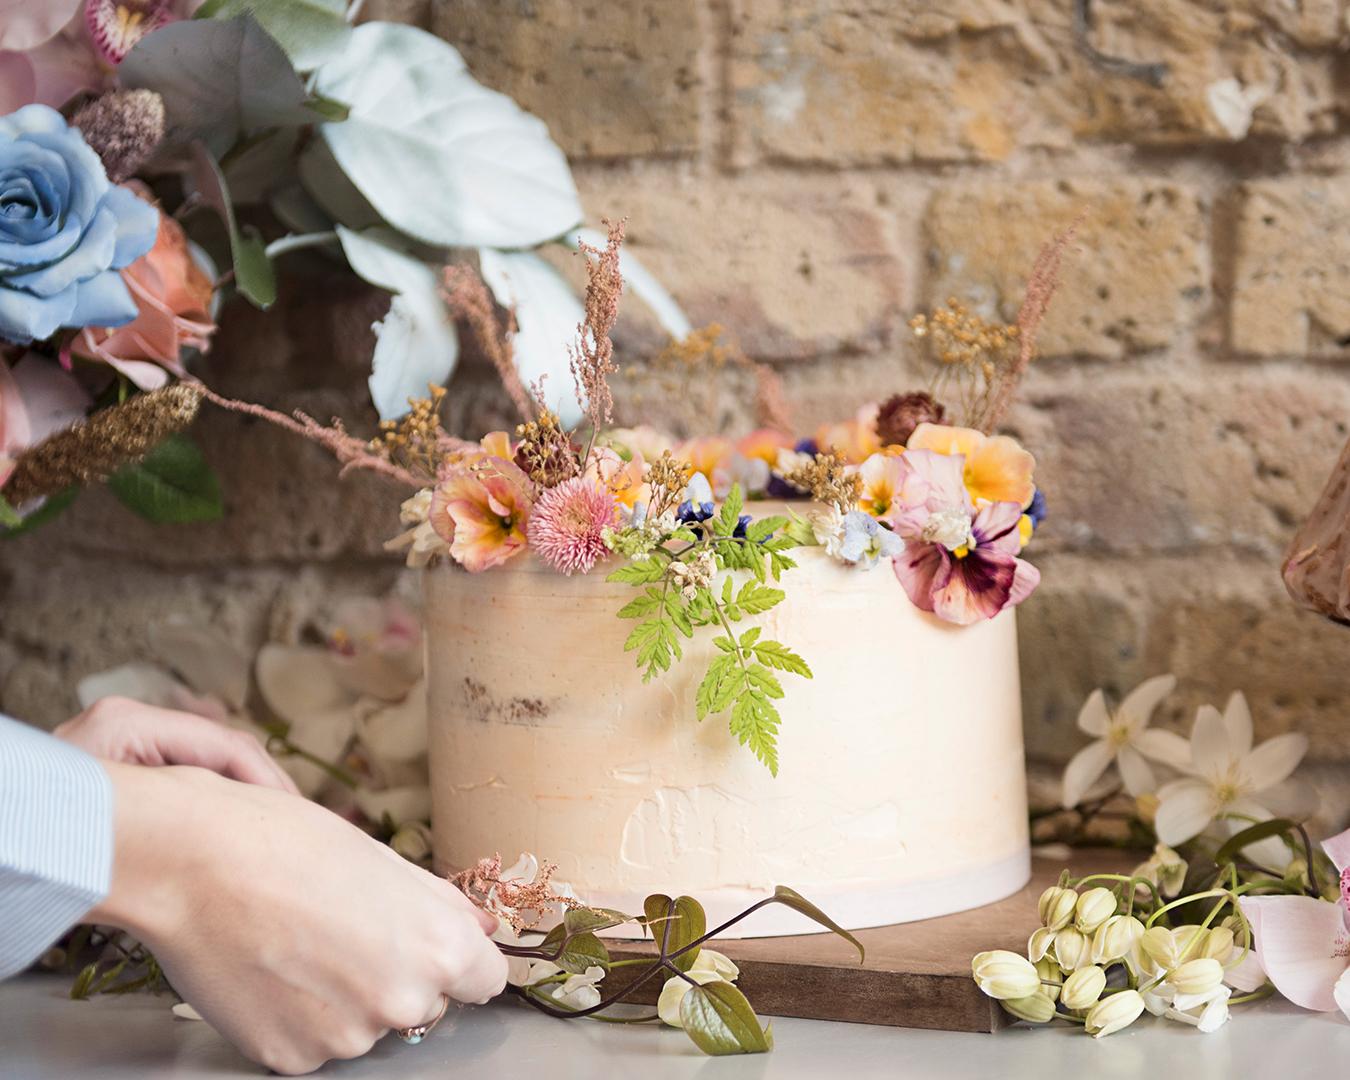 nancy-straughan-meet-up-networking-event-edible-flower-cake.jpg